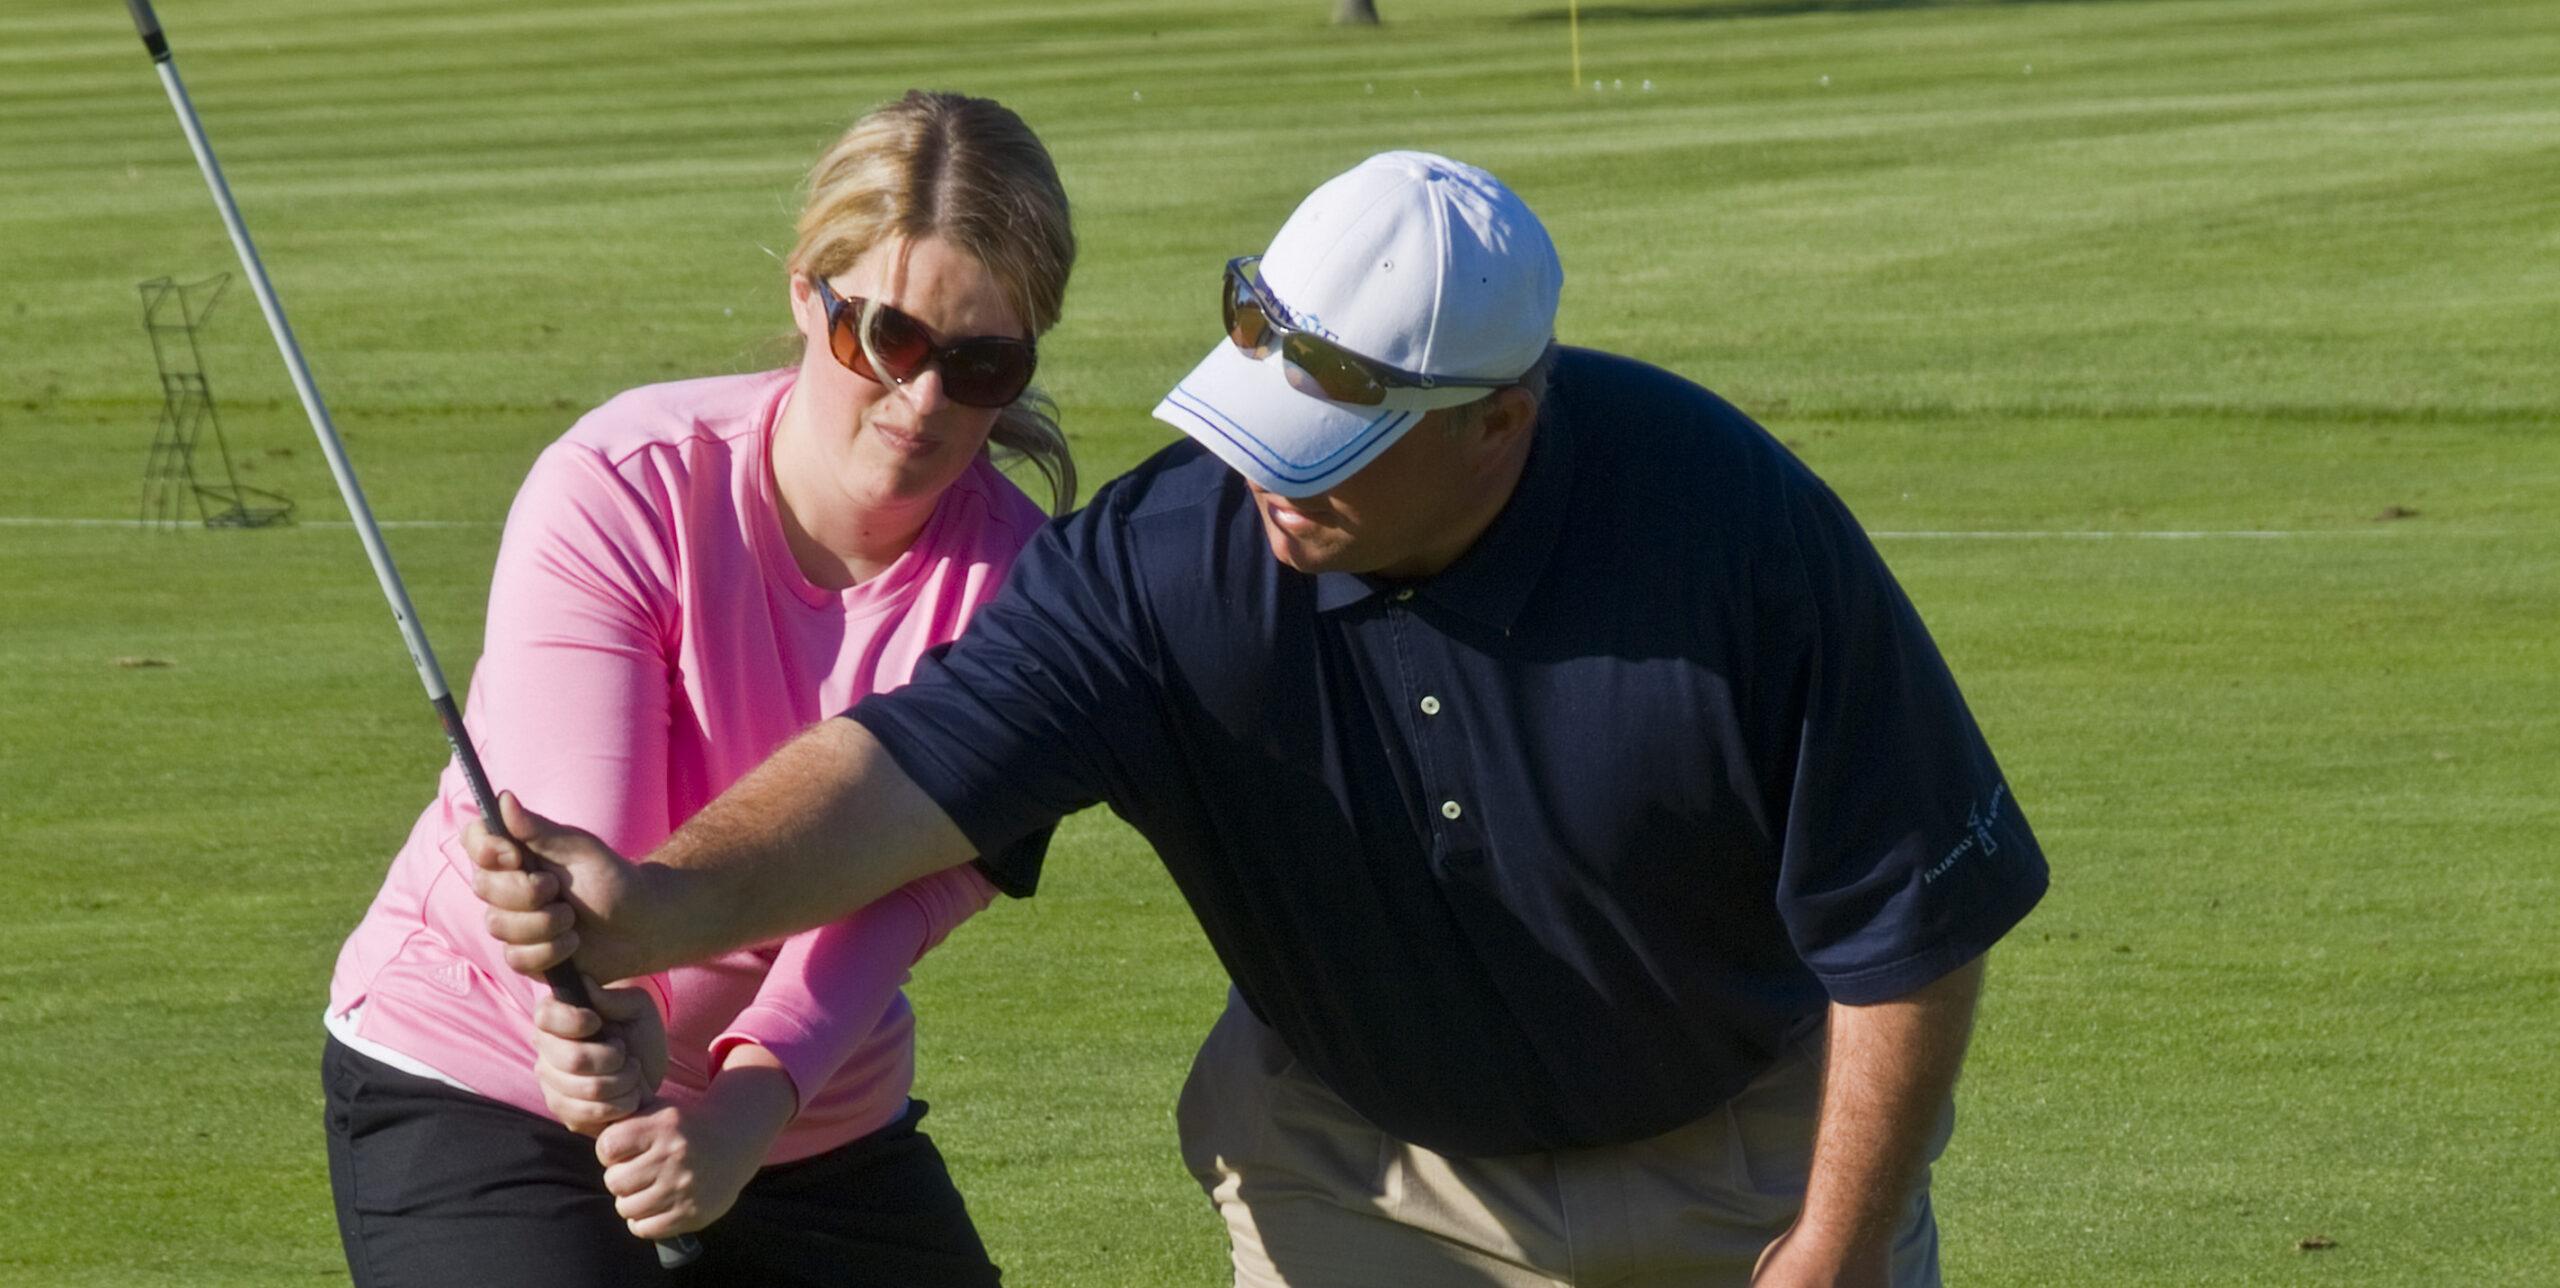 2020 Michigan PGA Teacher of the Year Mike Fay